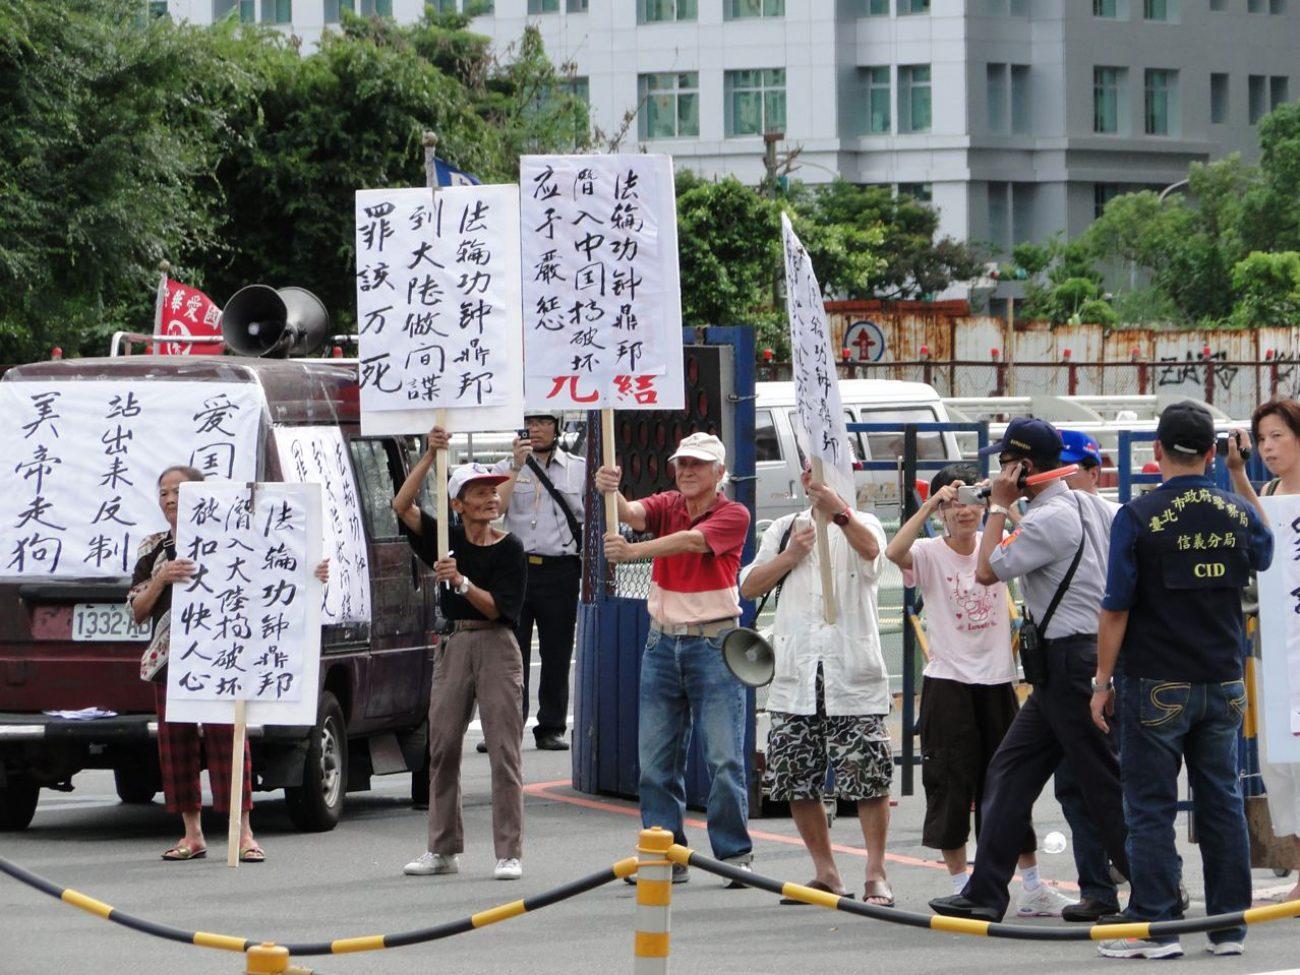 Anti Falun Gong protest